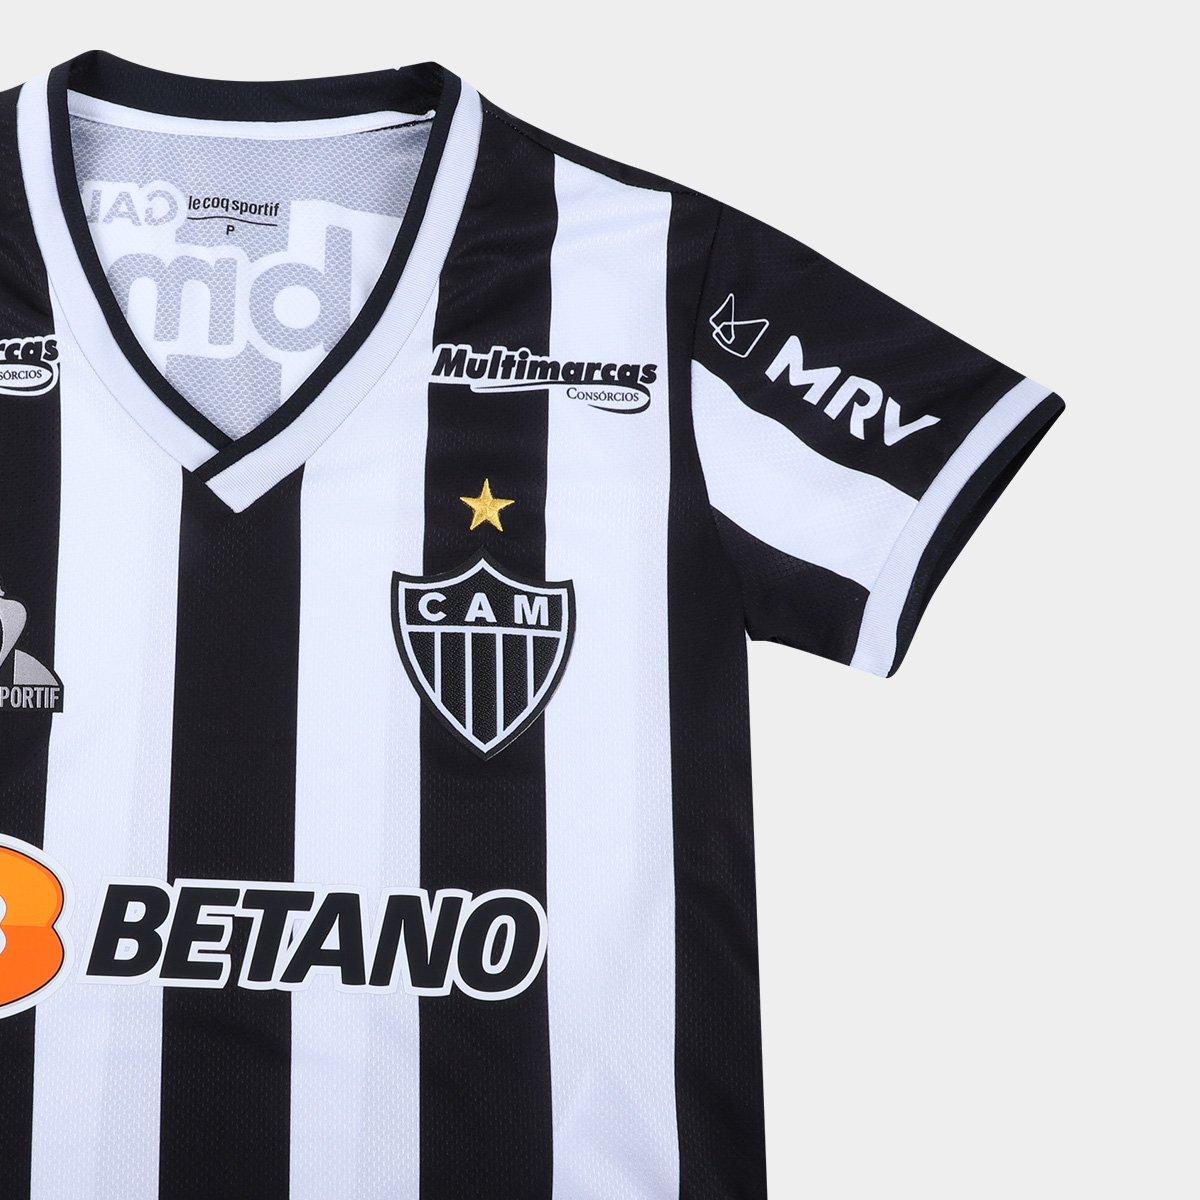 Camisa Atlético Mineiro I 21/22 s/nº Le Coq Feminina